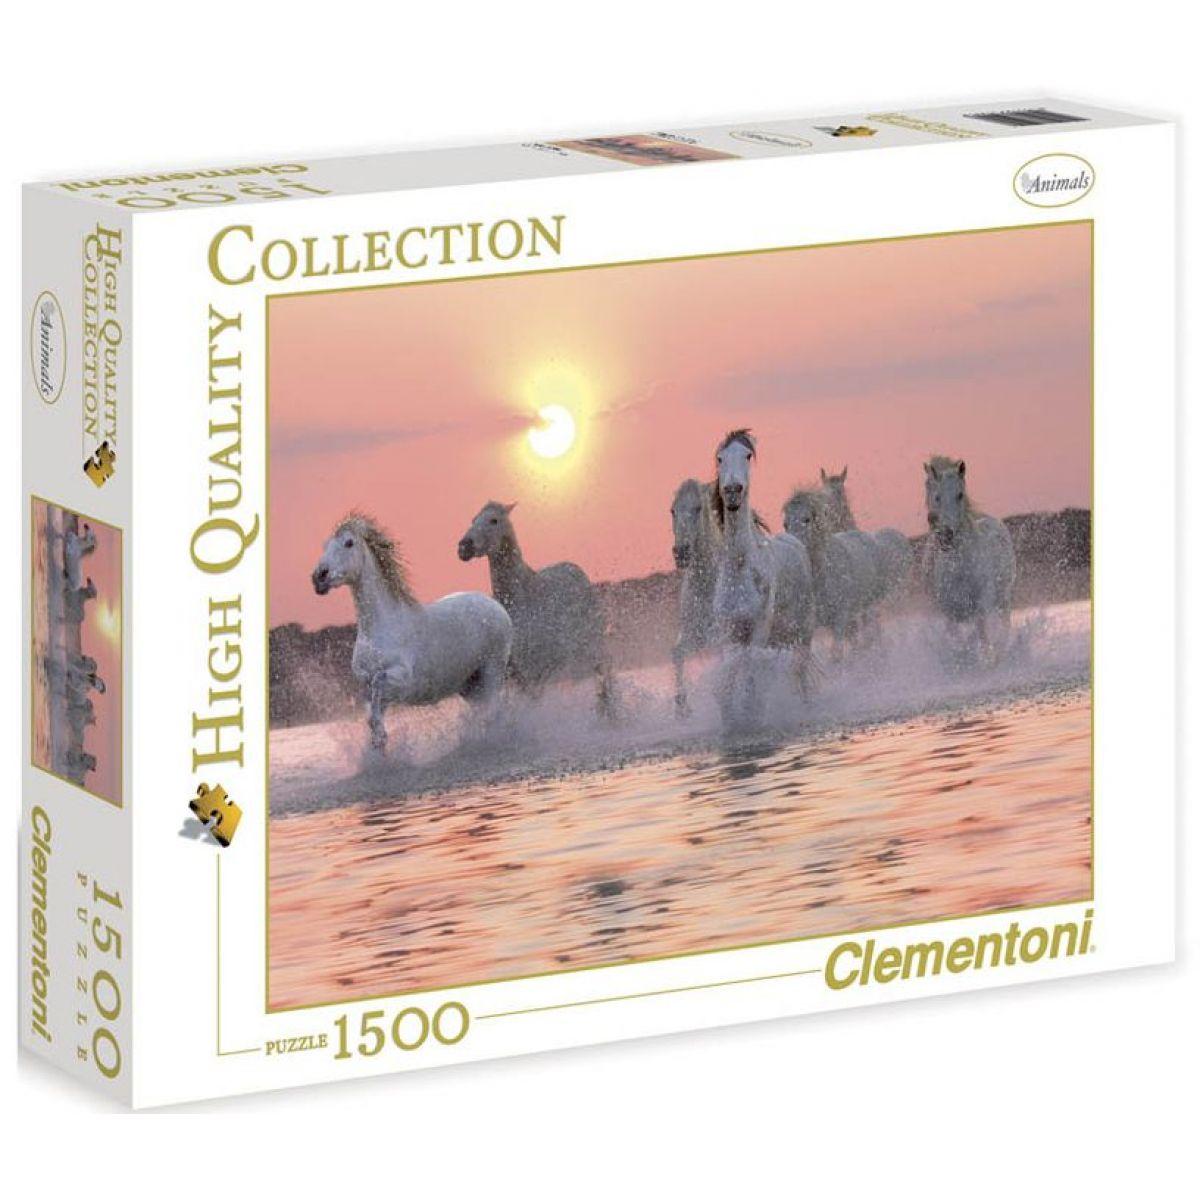 Clementoni 31991 - Puzzle 1500, Koně ve vodě